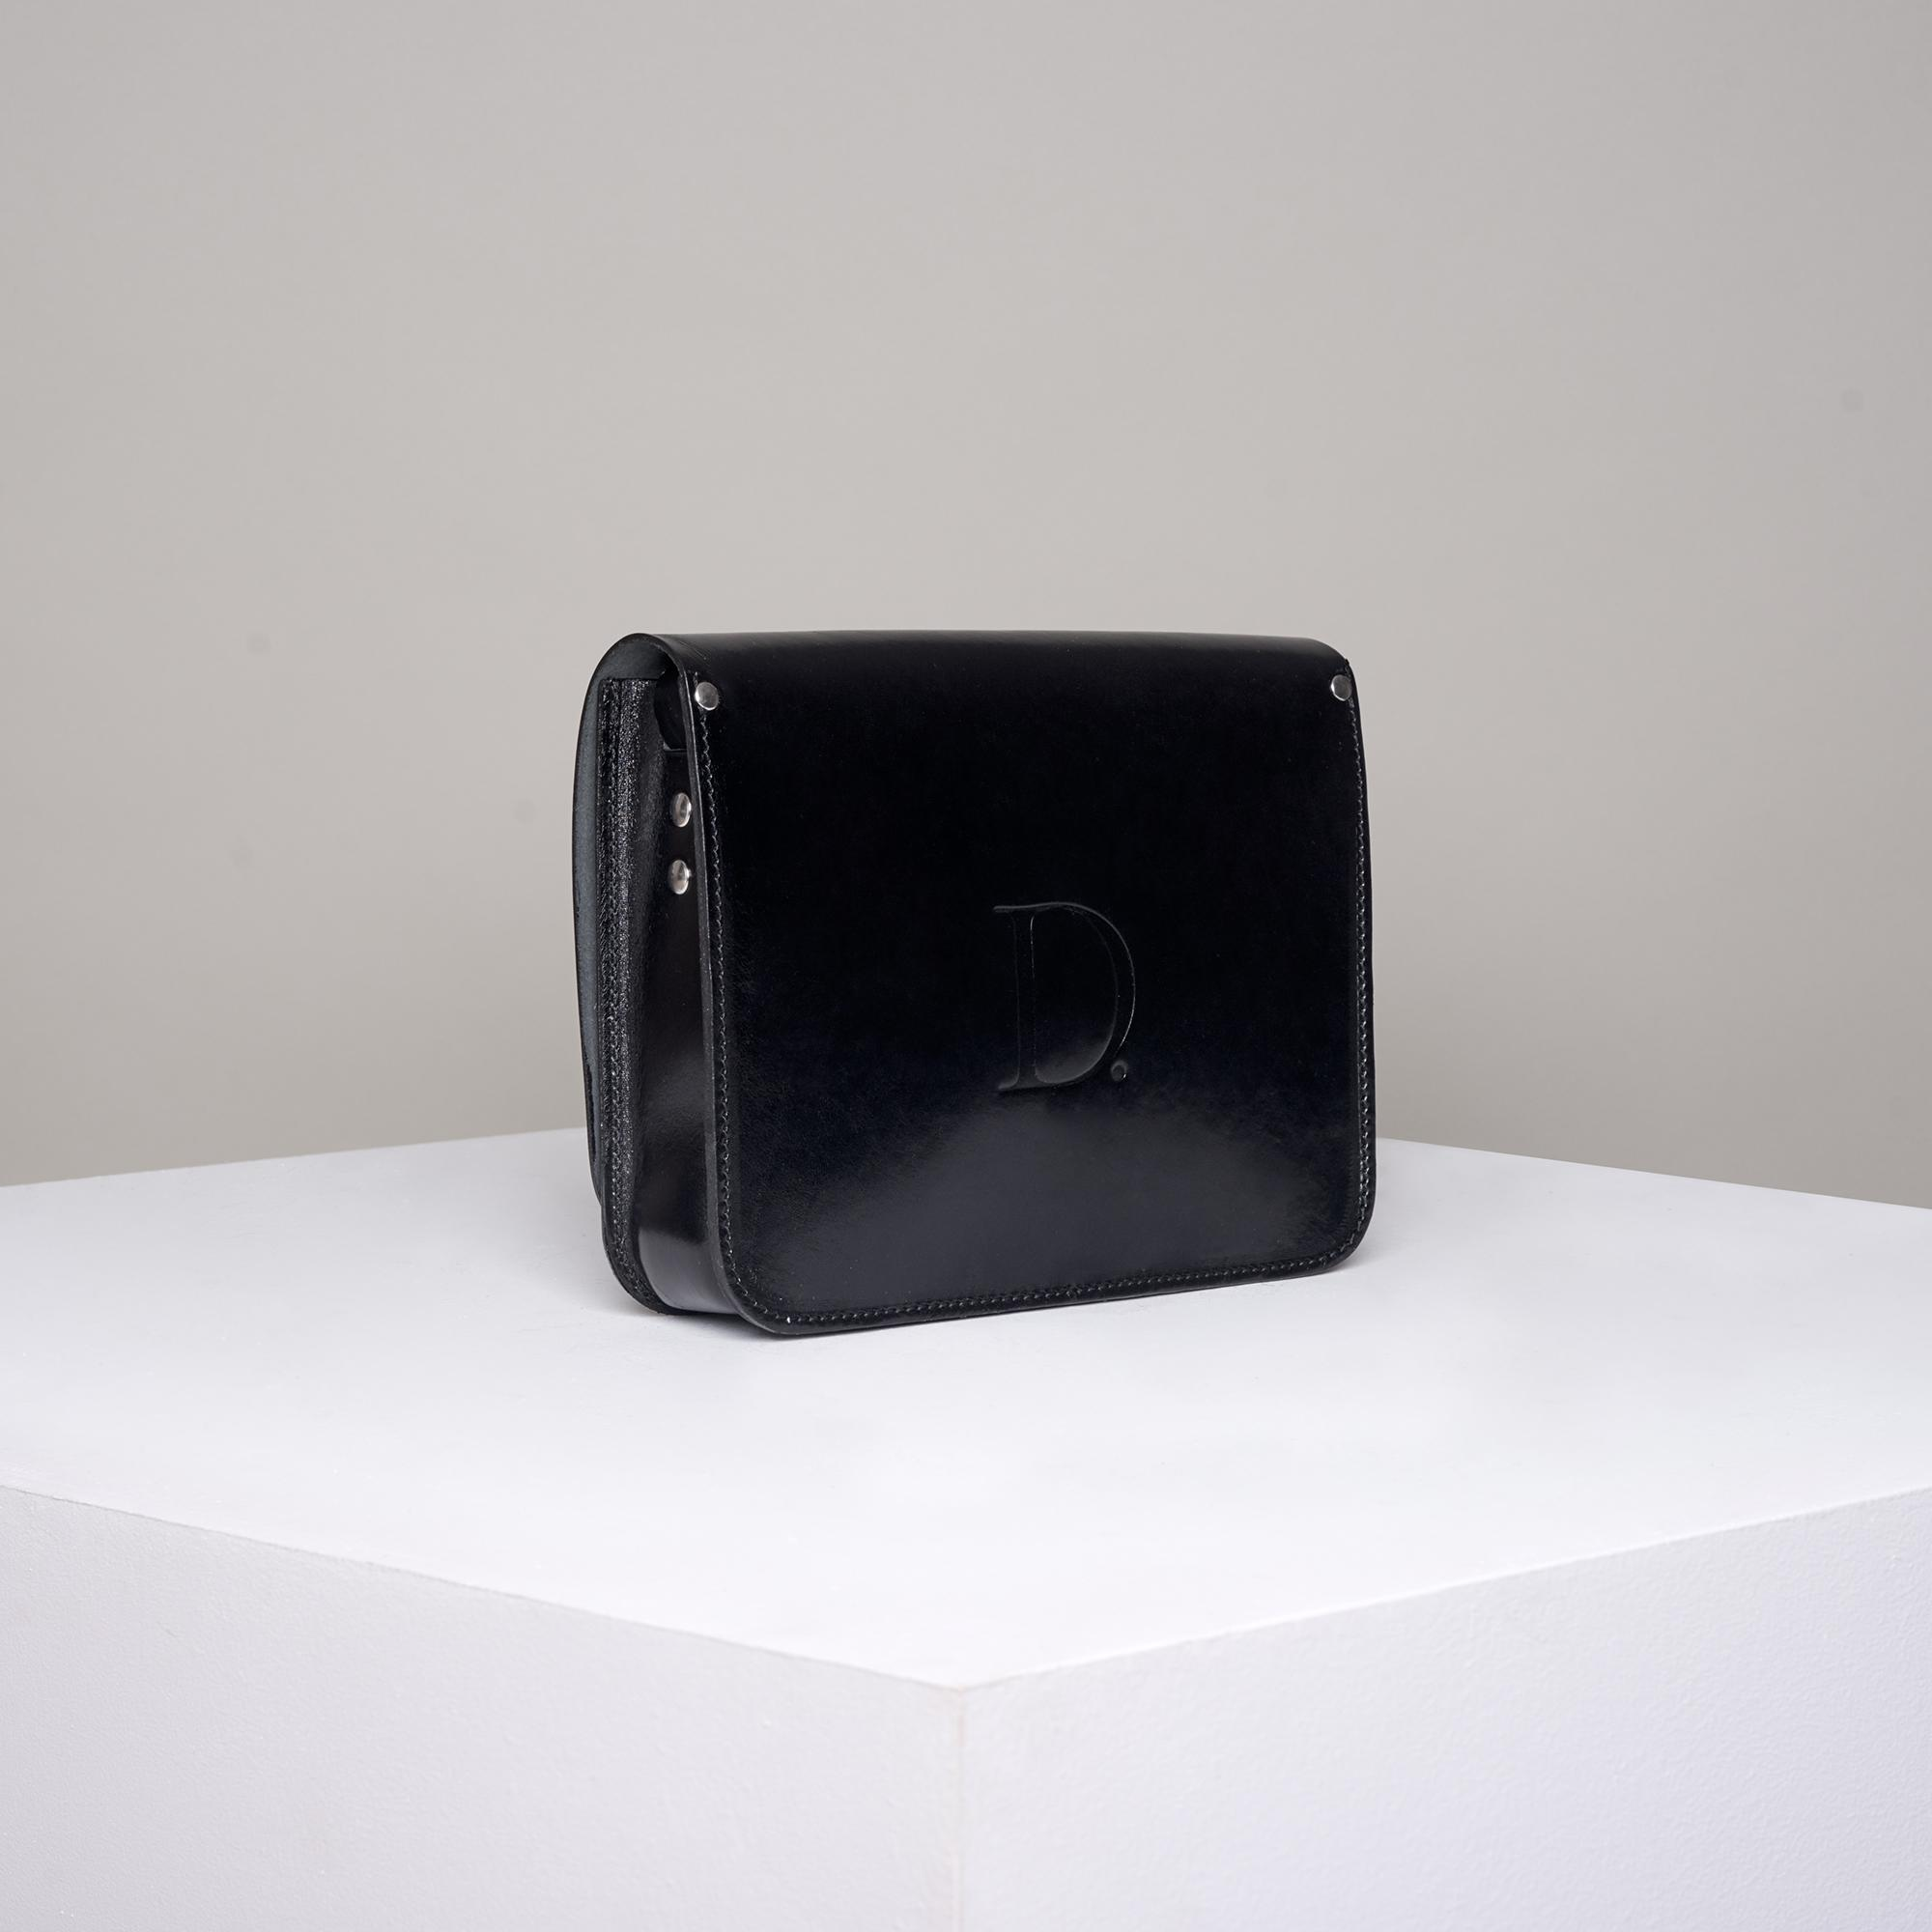 Czarna skórzana torebka rozmiar - Departament.Store